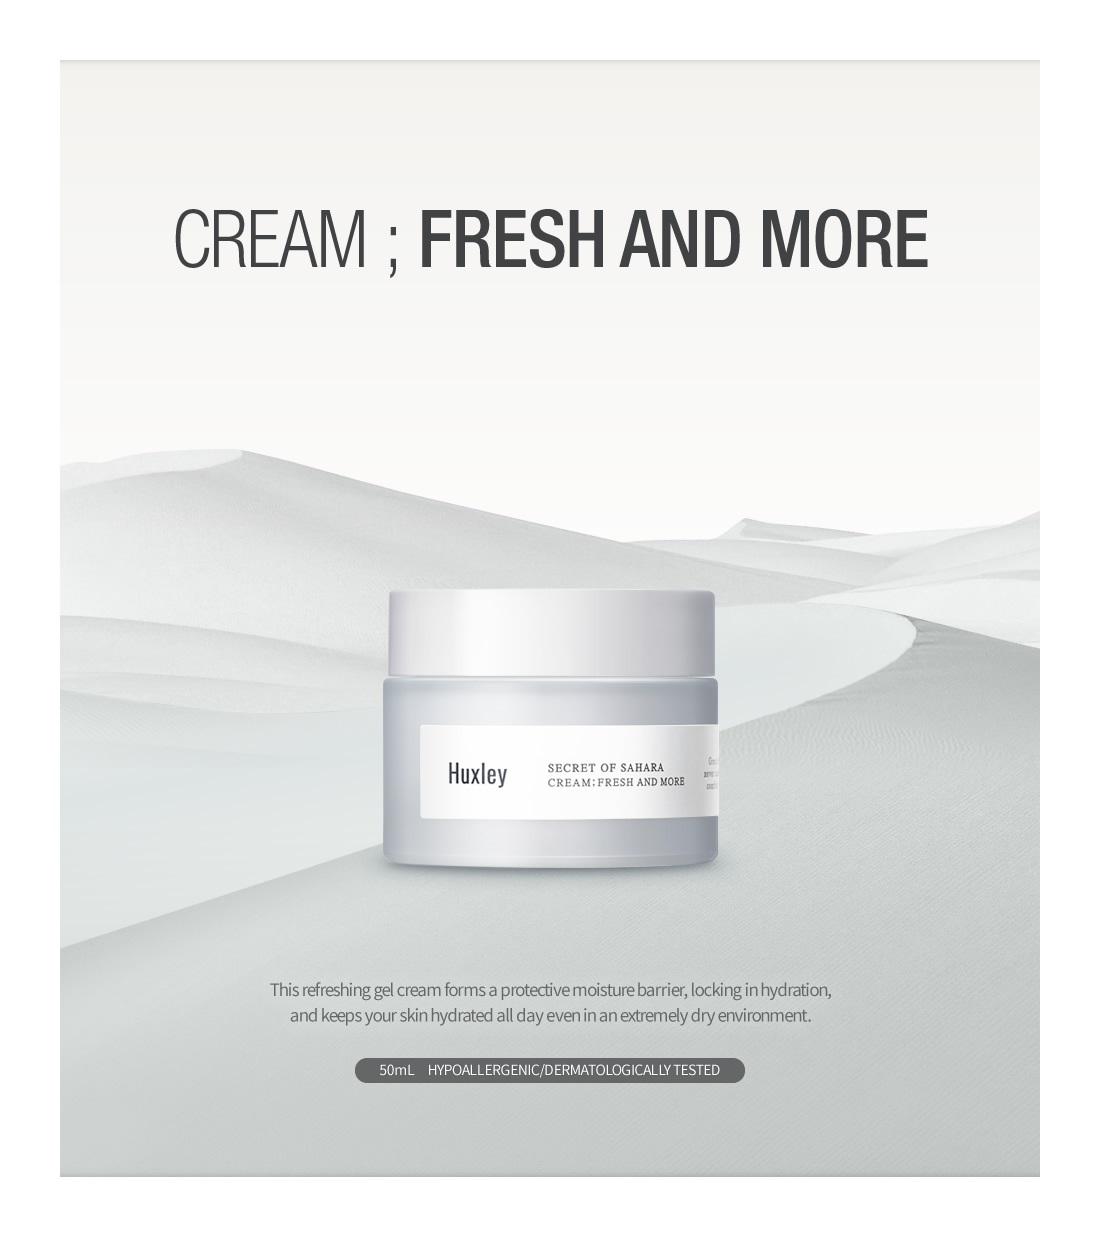 Huxley Secret Of Sahara Cream FRESH AND MORE (50ml 1.69 oz) Korea Cosmetic  8809422531756   eBay